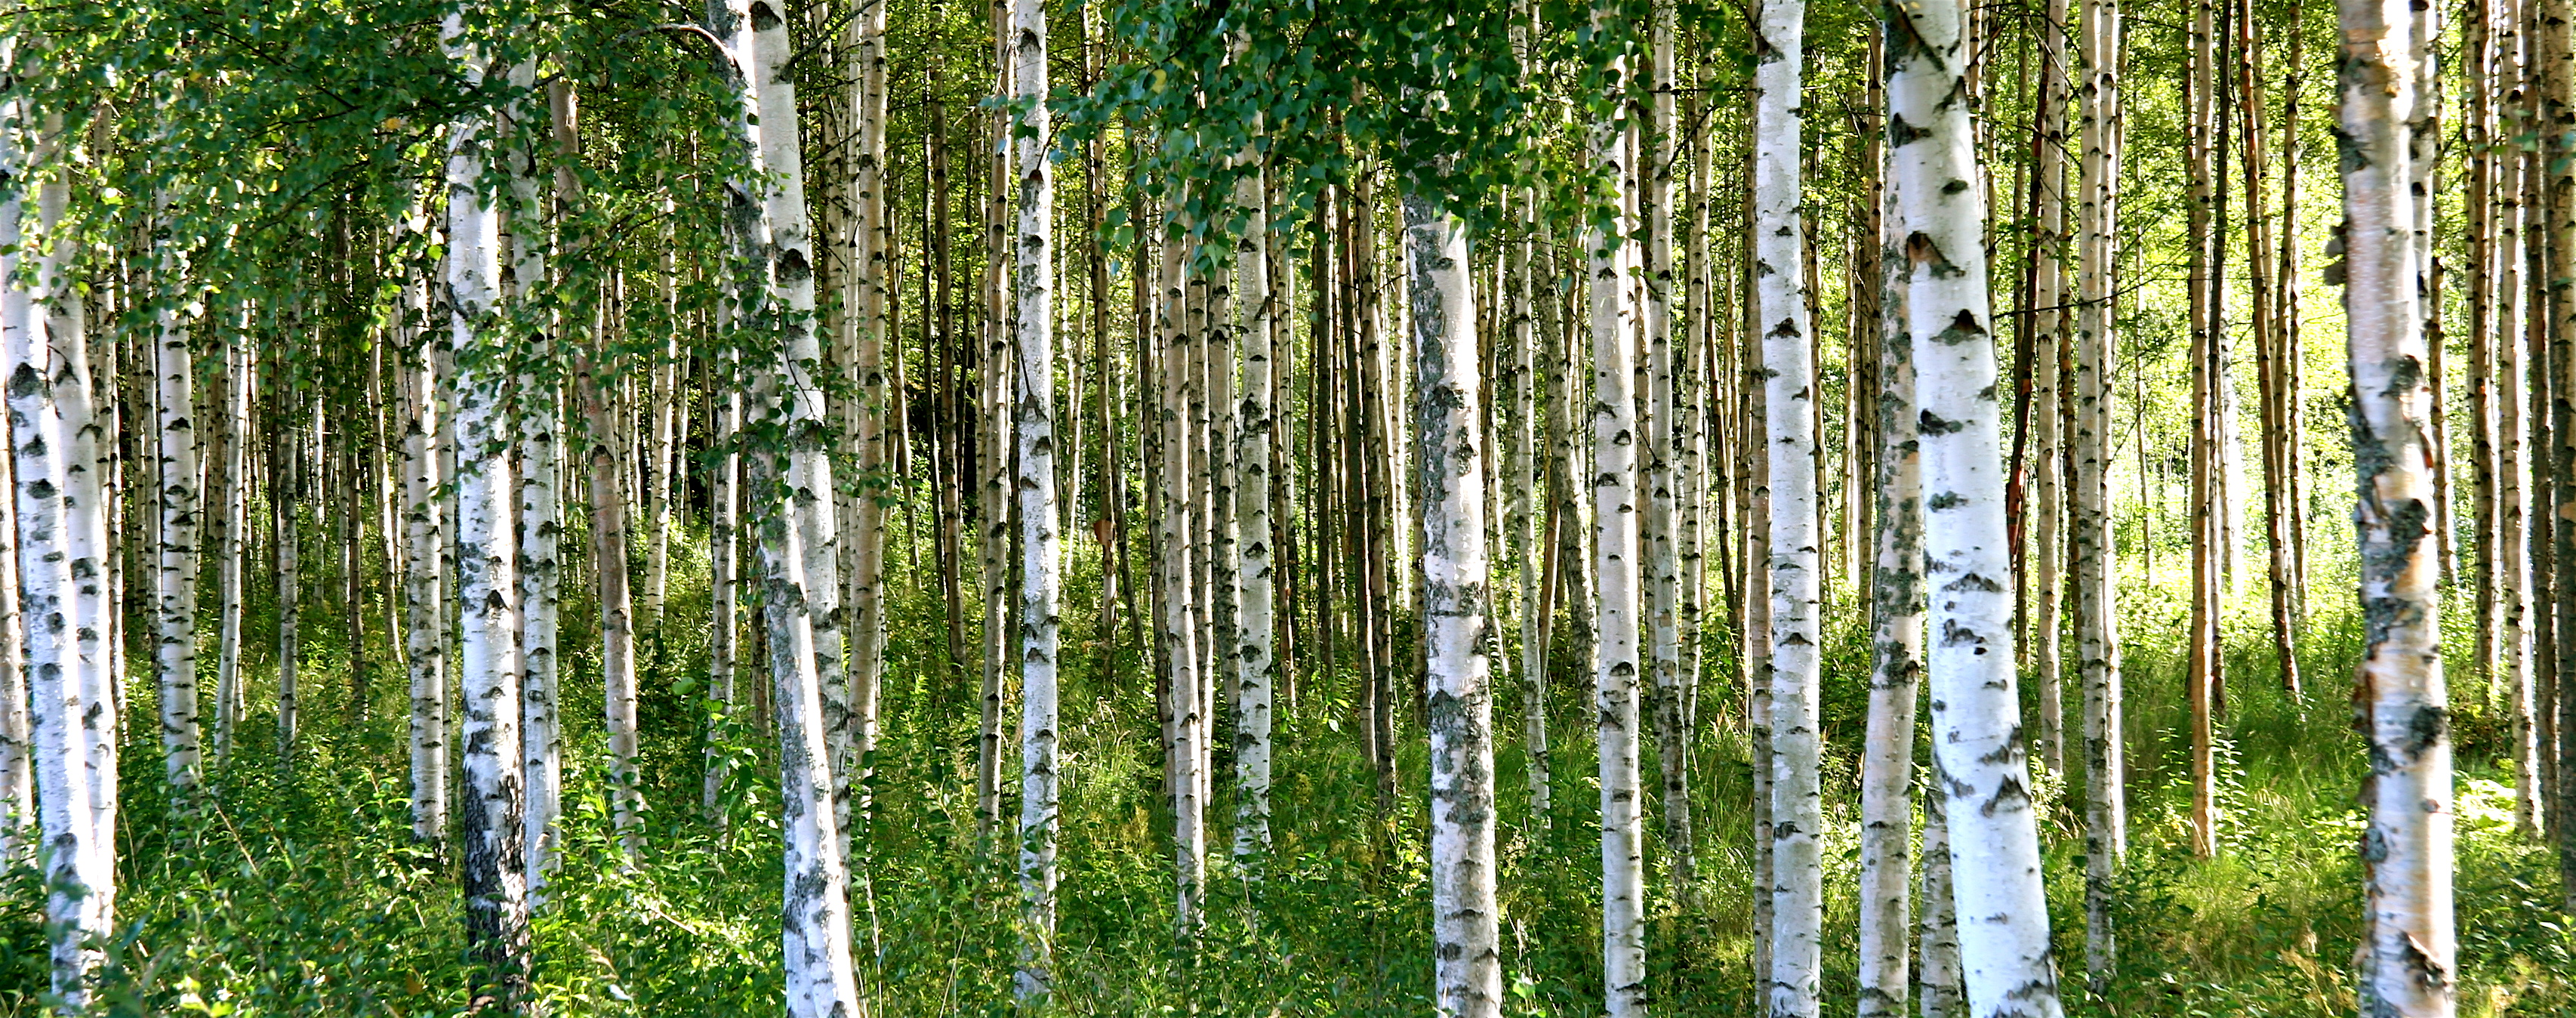 birch trees flickr photo sharing